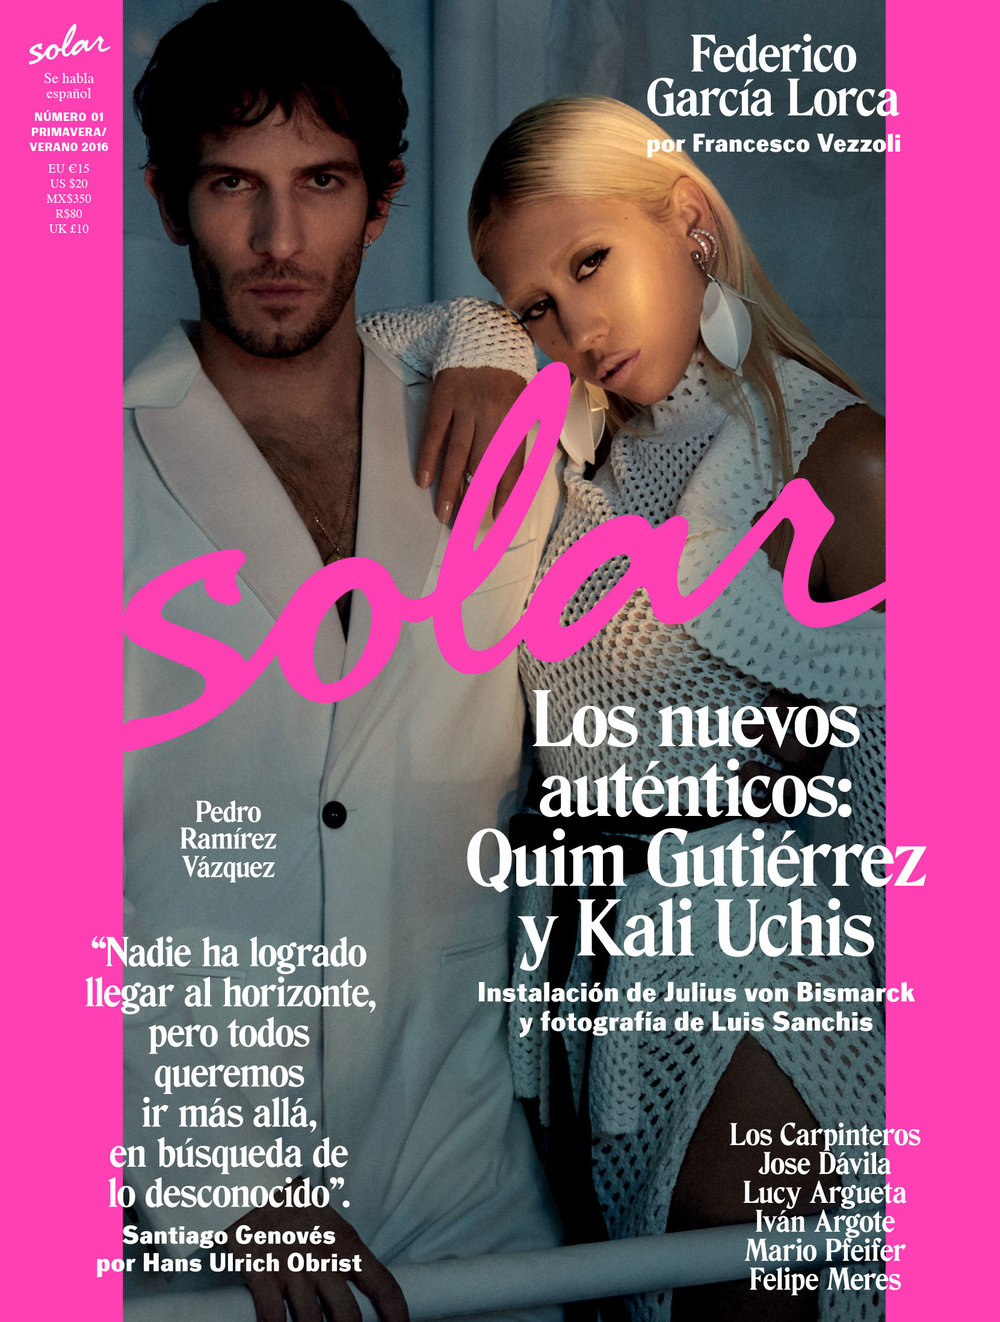 SOLAR 01 | Luis Sanchis